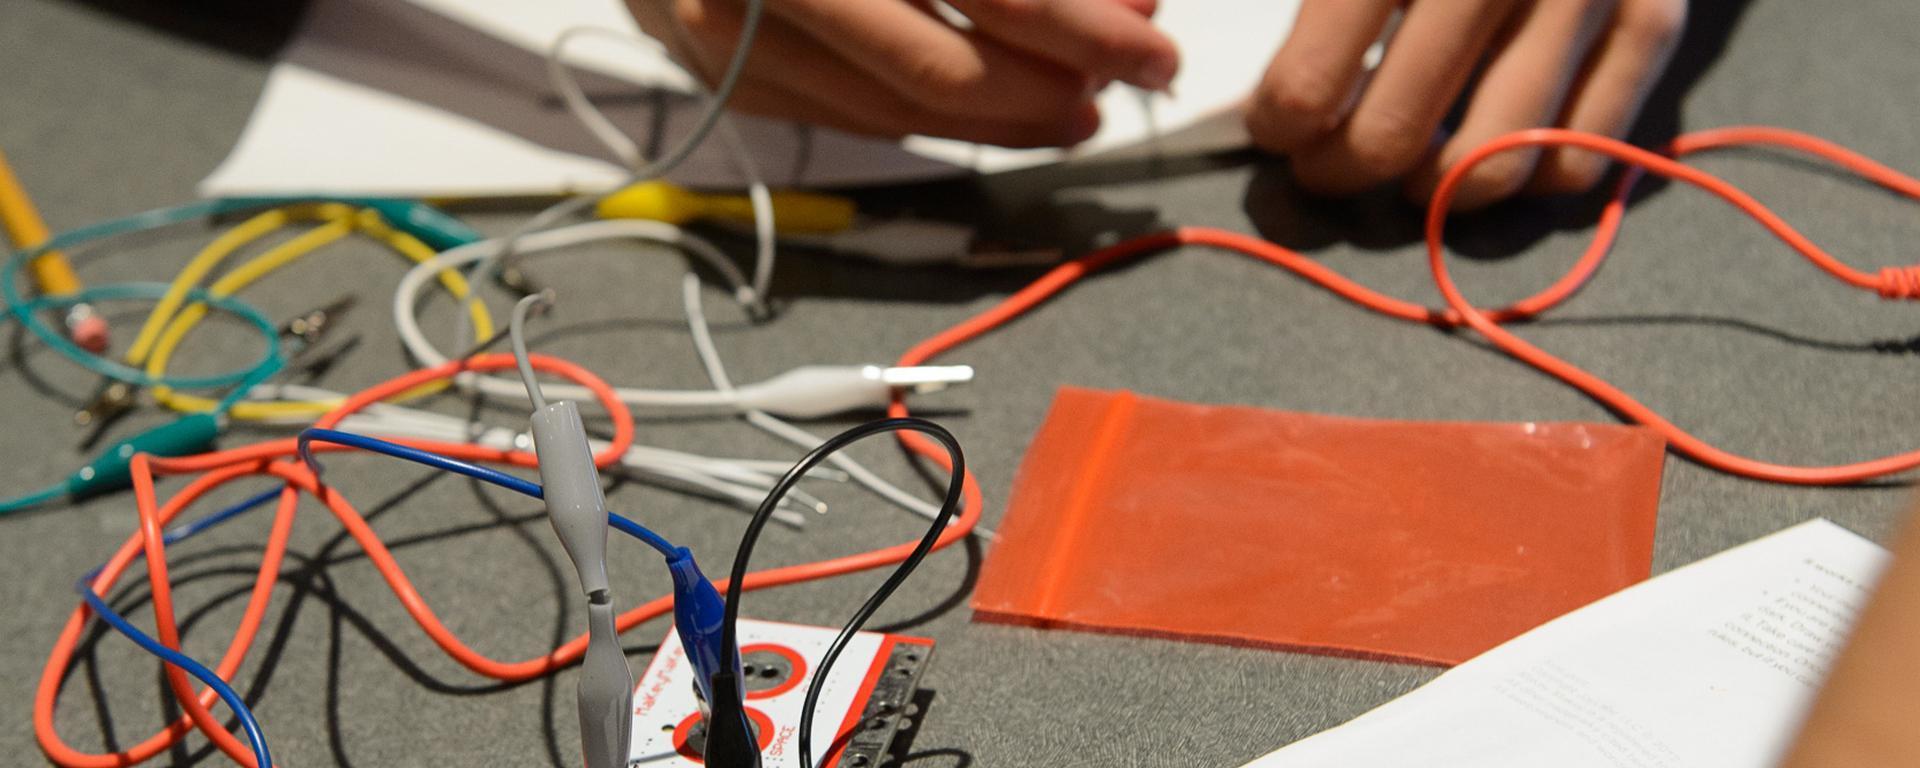 teens using a makey-makey circuit board